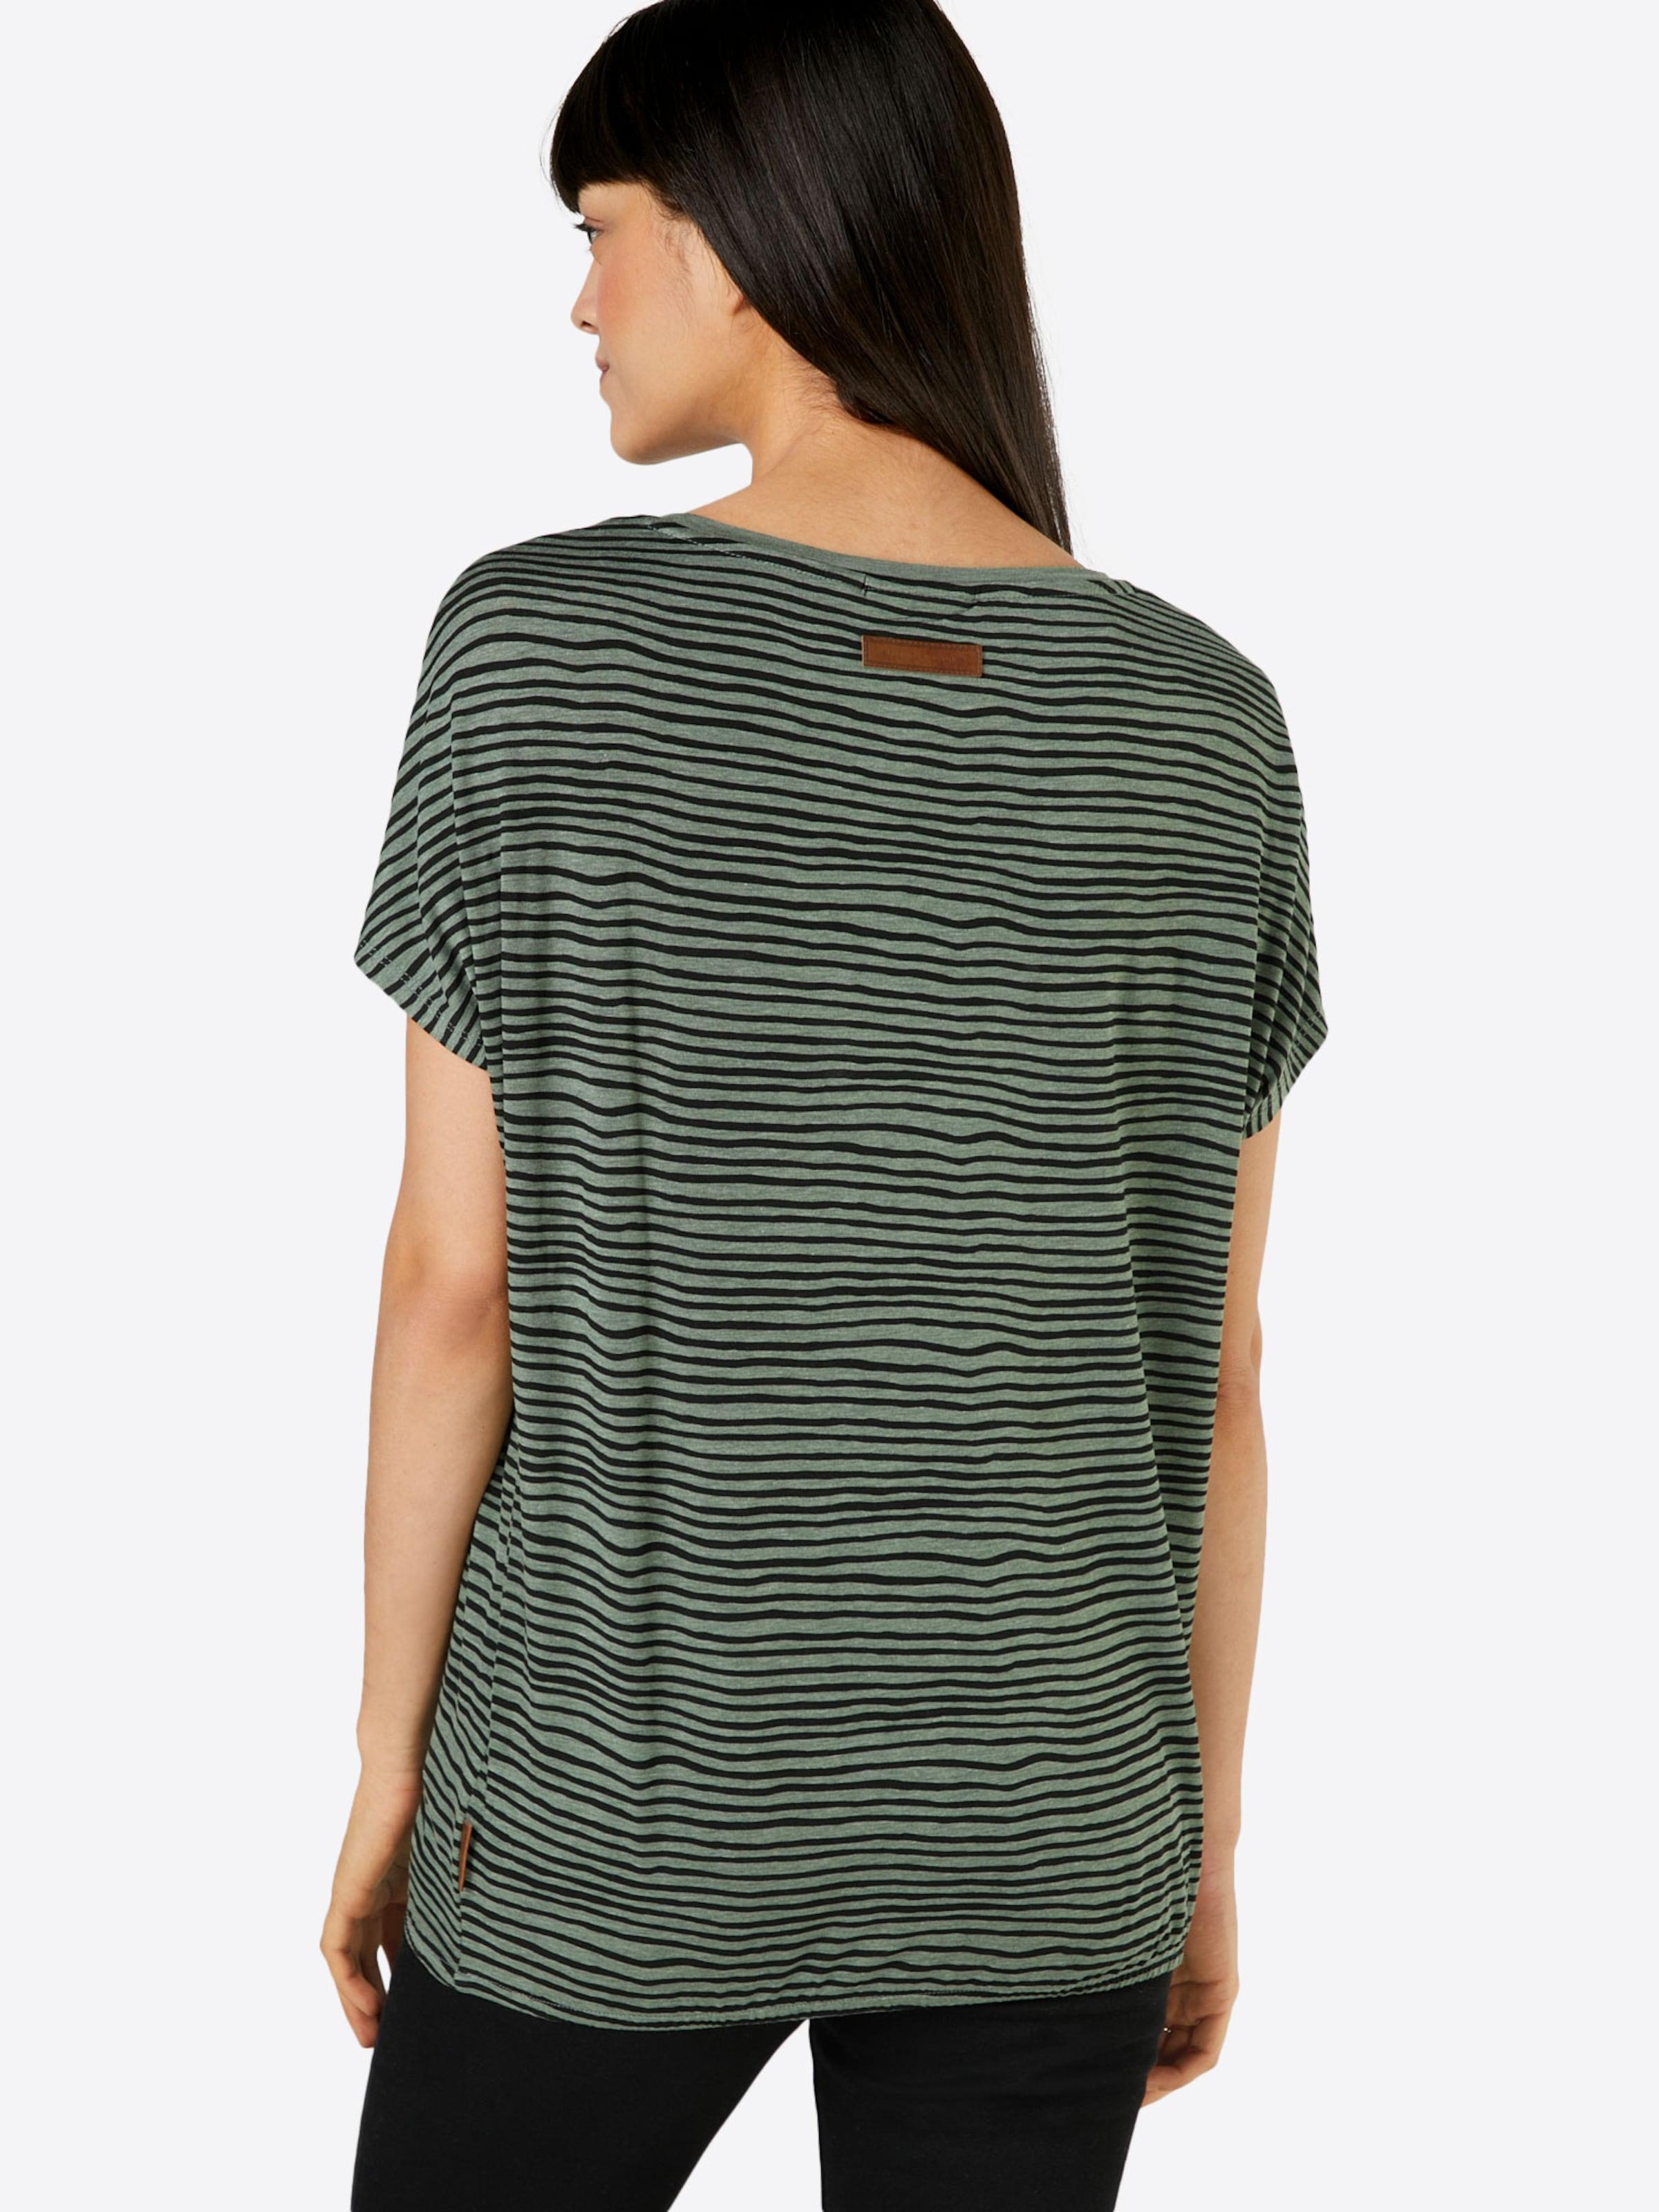 Rabatt Neue Ankunft naketano Oversize Shirt 'Bouncing II' Spielraum Mit Kreditkarte PUj8GKP